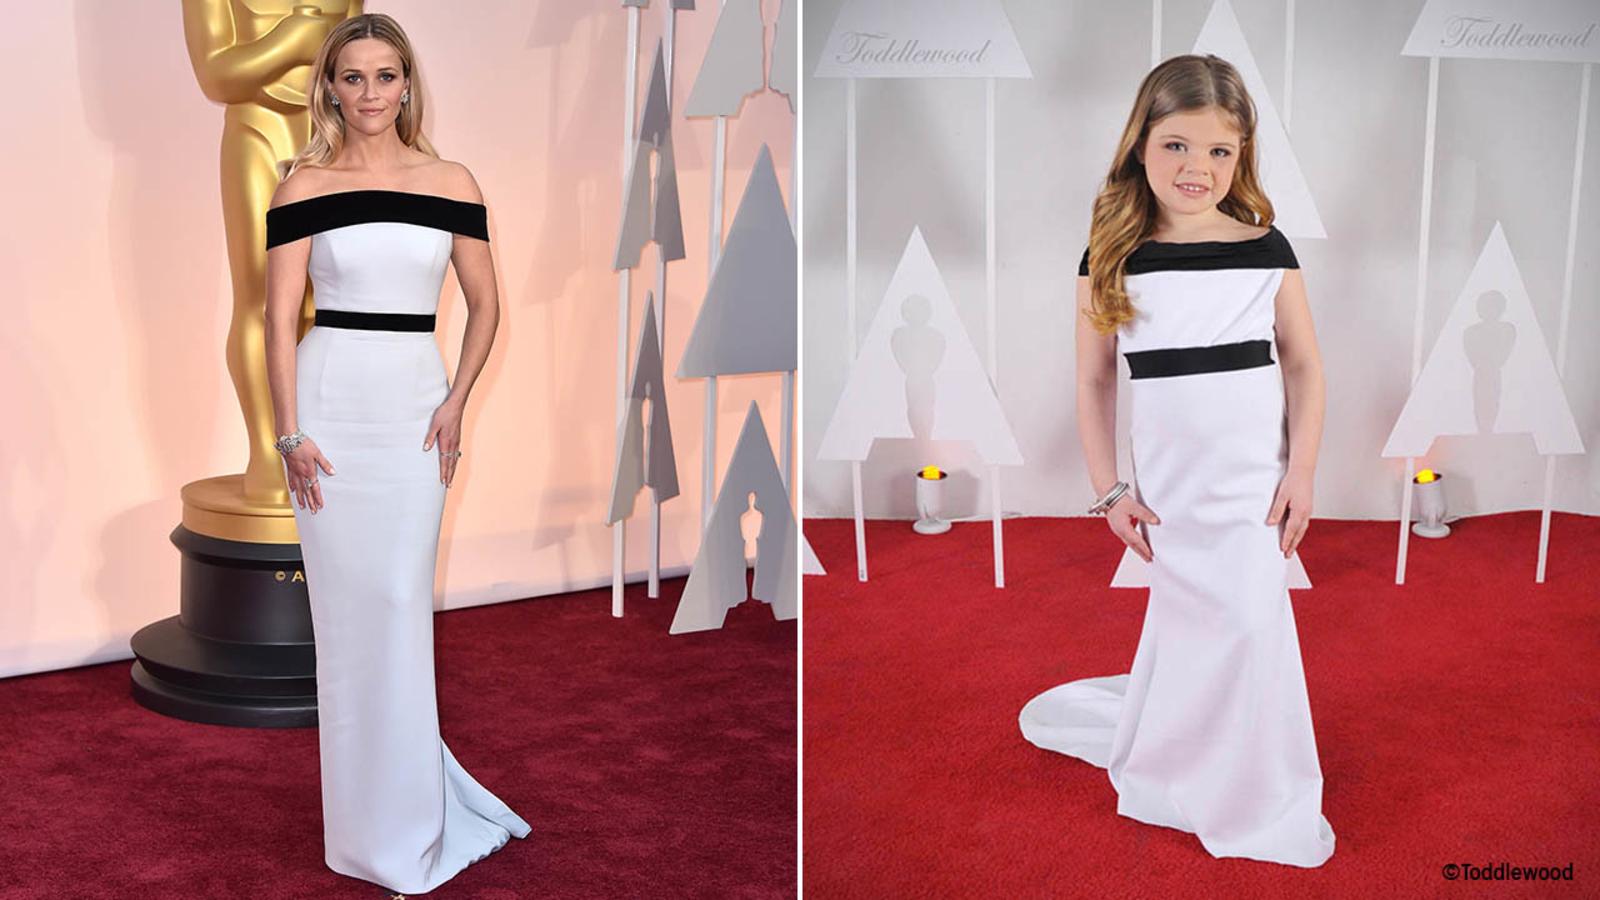 Photos Adorable Kids Recreate Celebrity Red Carpet Fashions On The View Abc13 Houston